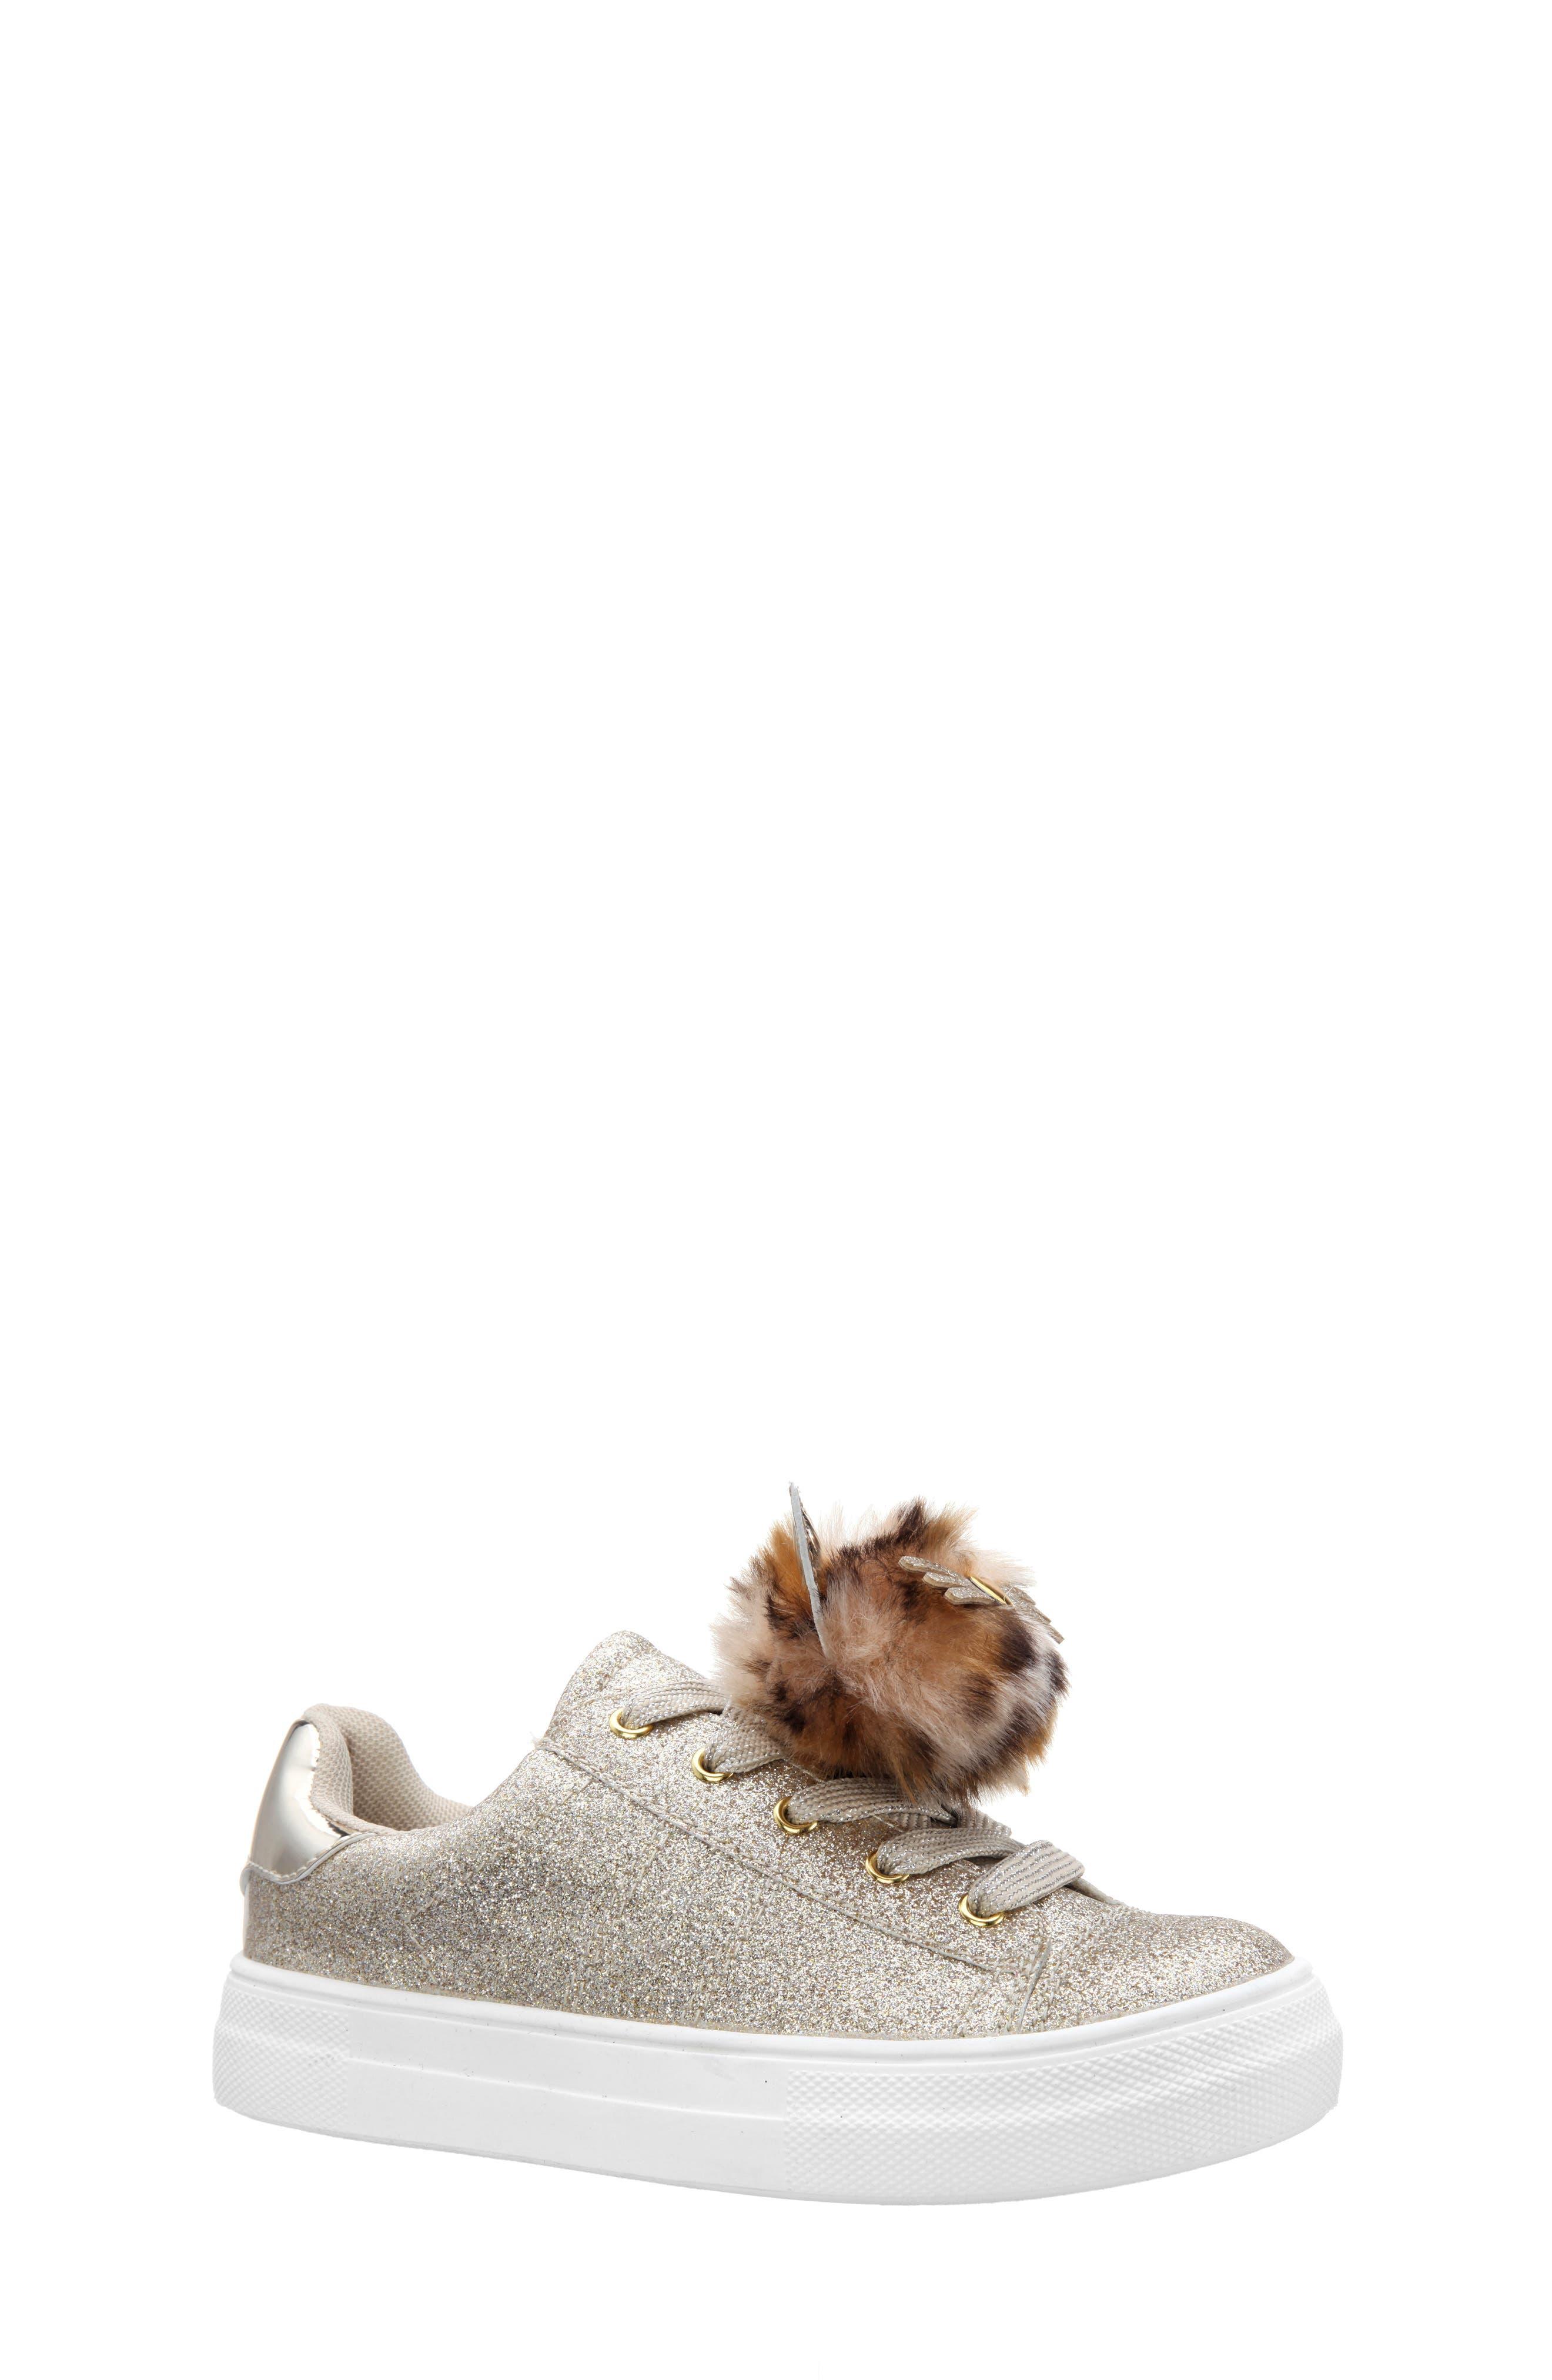 Toddler Girls Nina Britteni Animal Pompom Glitter Sneaker Size 11 M  Metallic